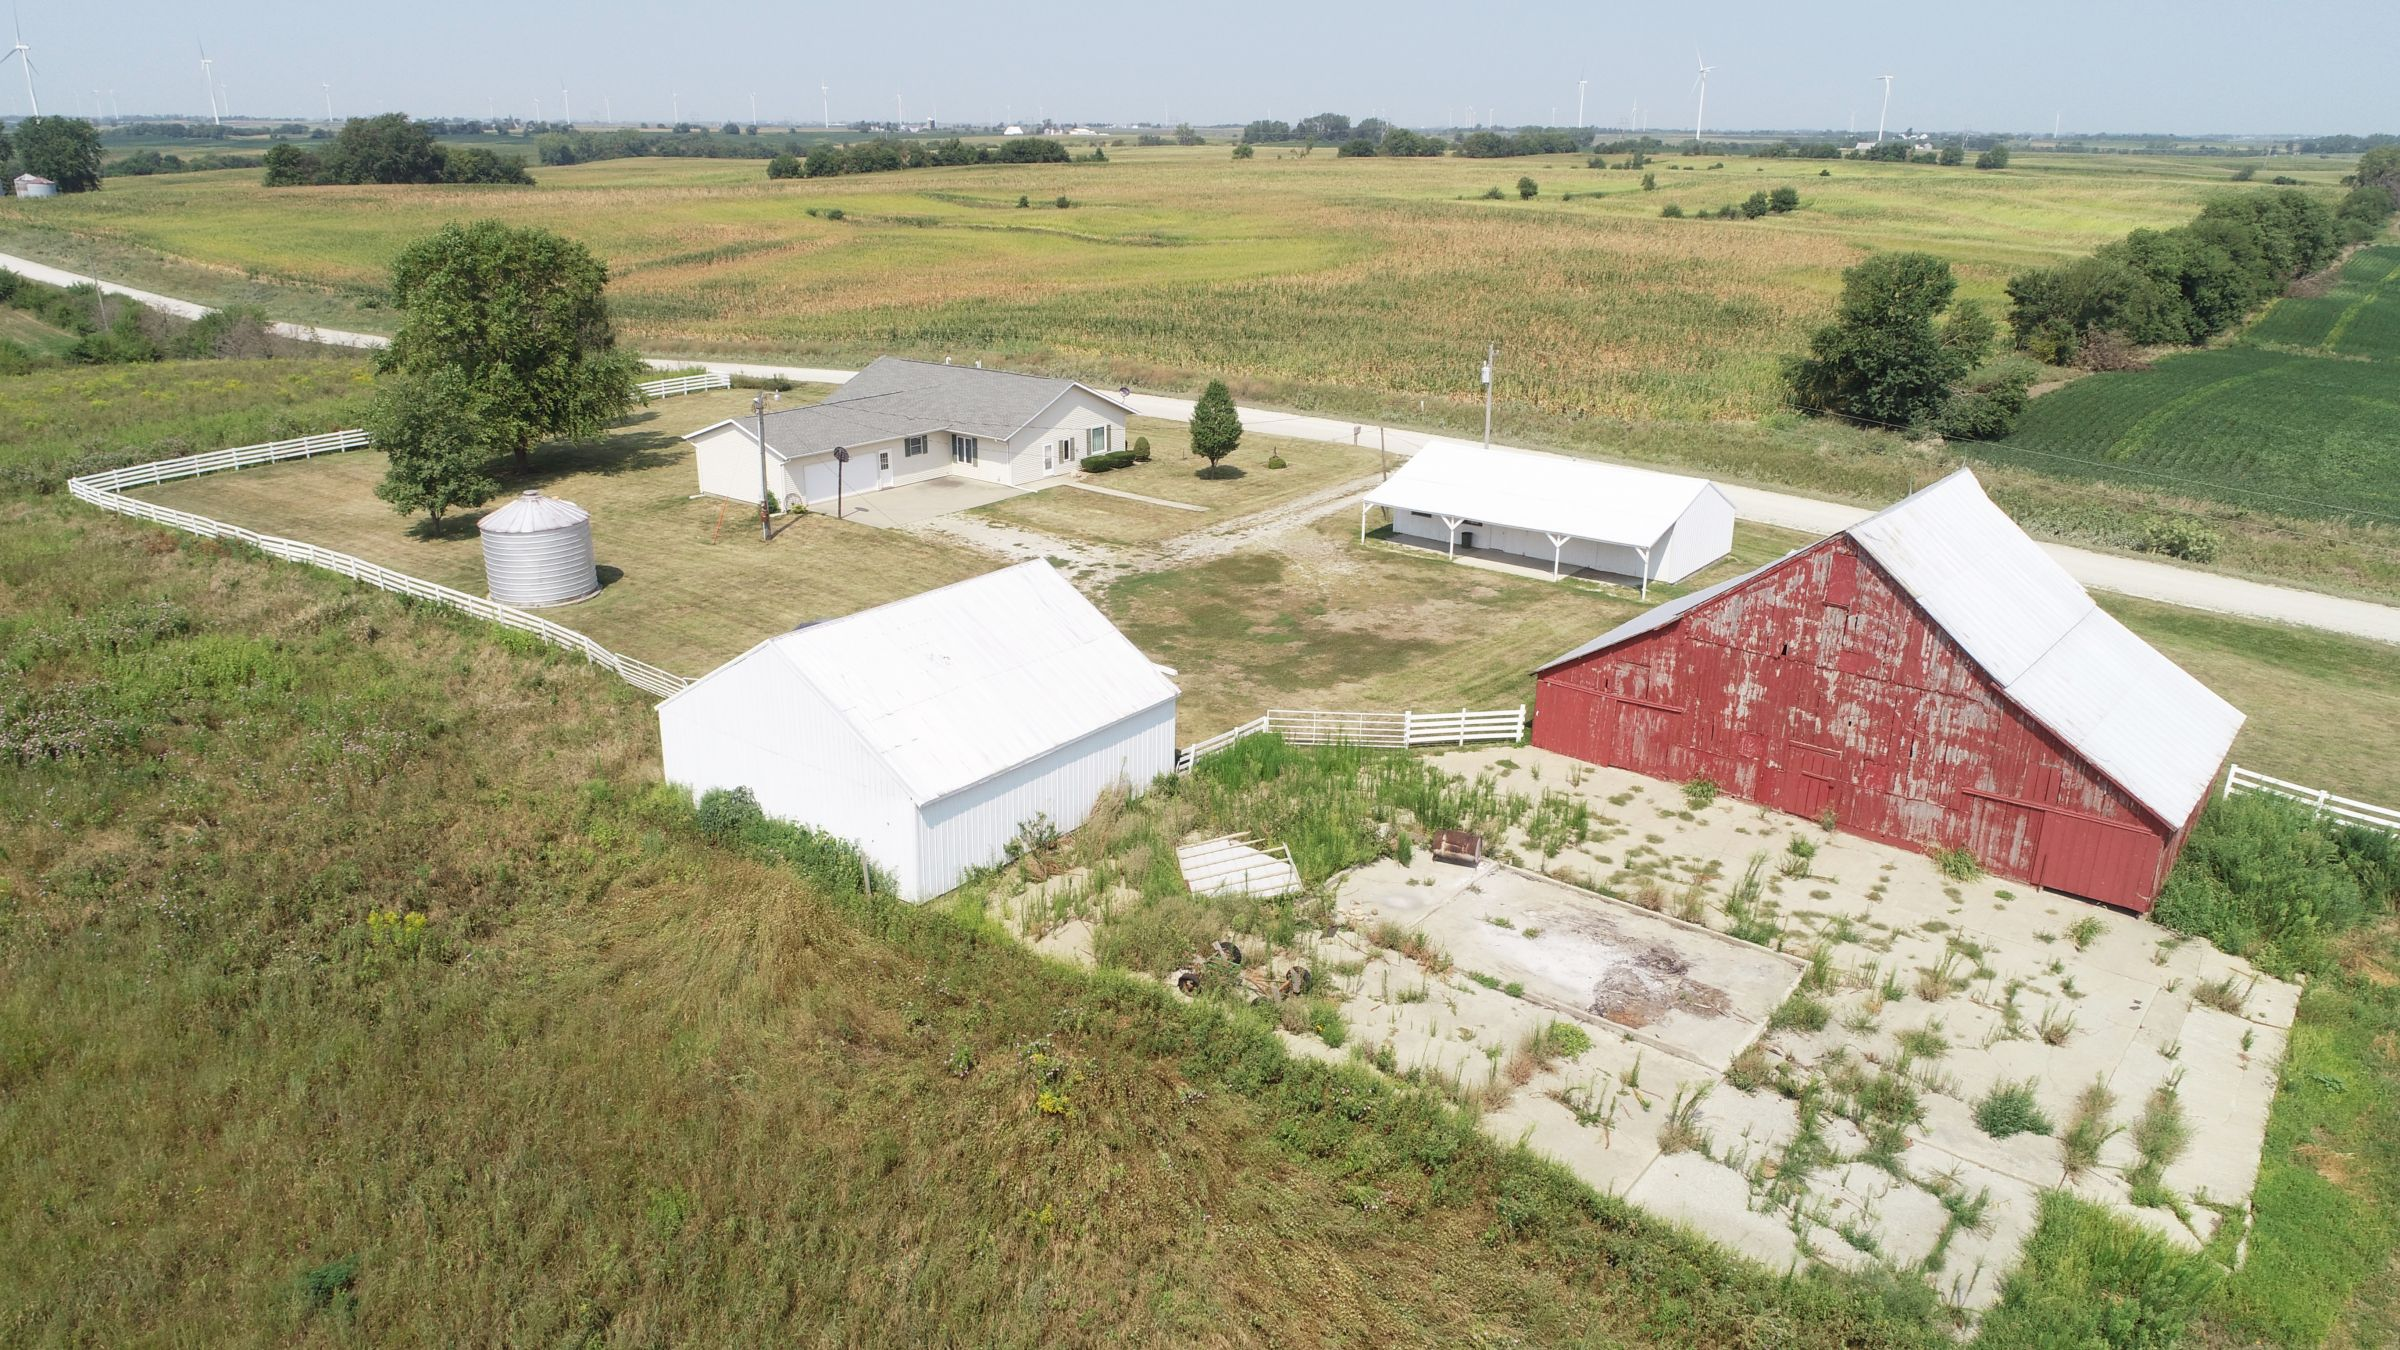 residential-land-poweshiek-county-iowa-5-acres-listing-number-15149-6-2020-08-28-201127.jpg